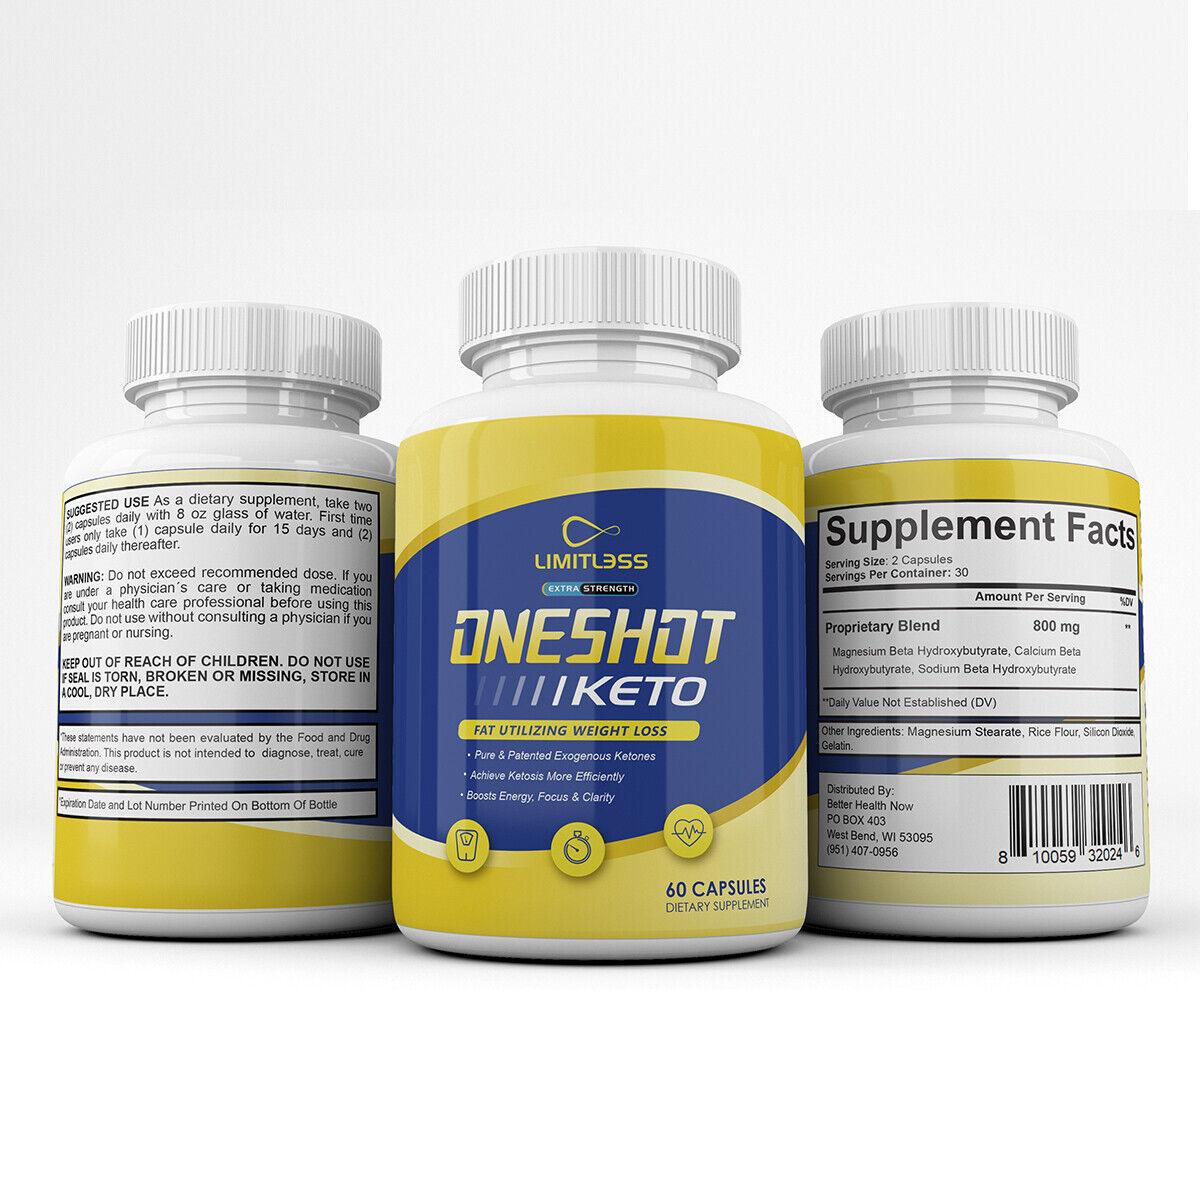 One Shot Keto Pills - Limitless Oneshot Keto Capsules - 5 Month Supply 2